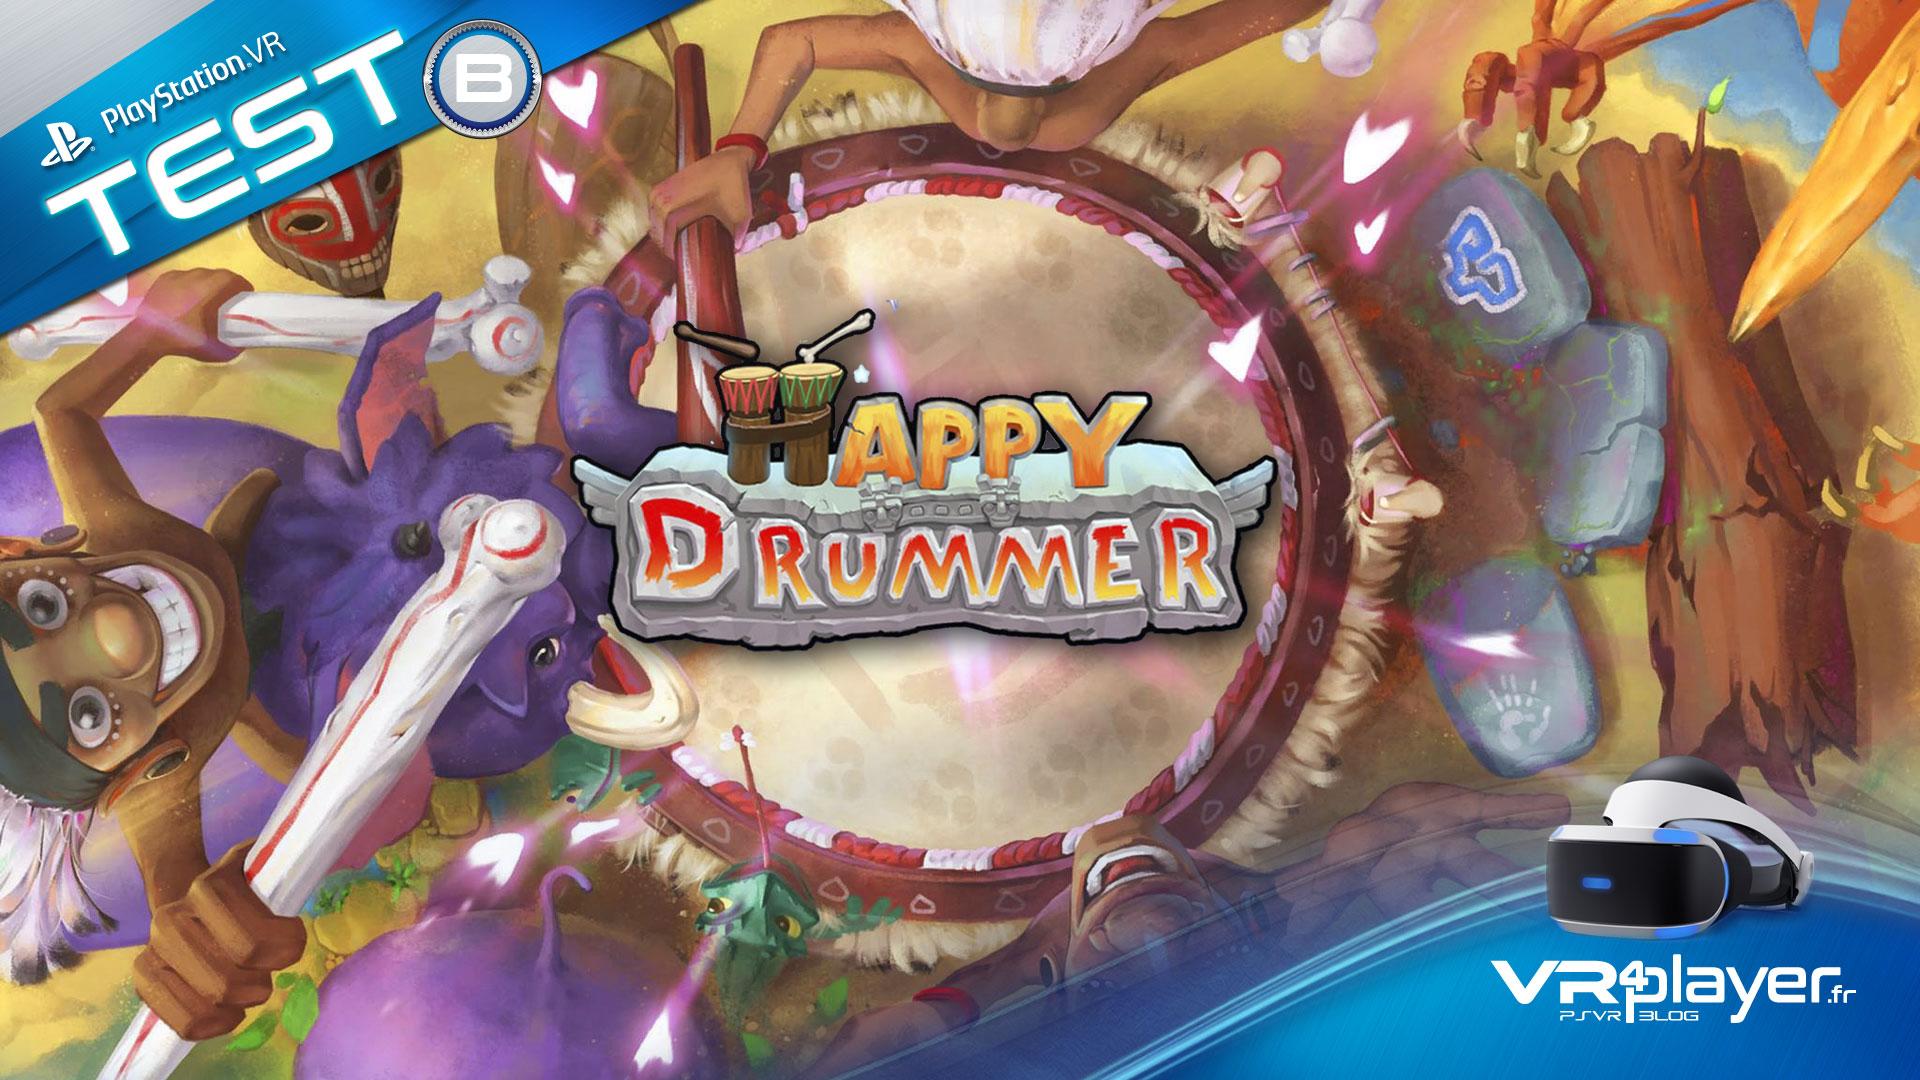 Happy Drummer PSVR vrplayer.fr